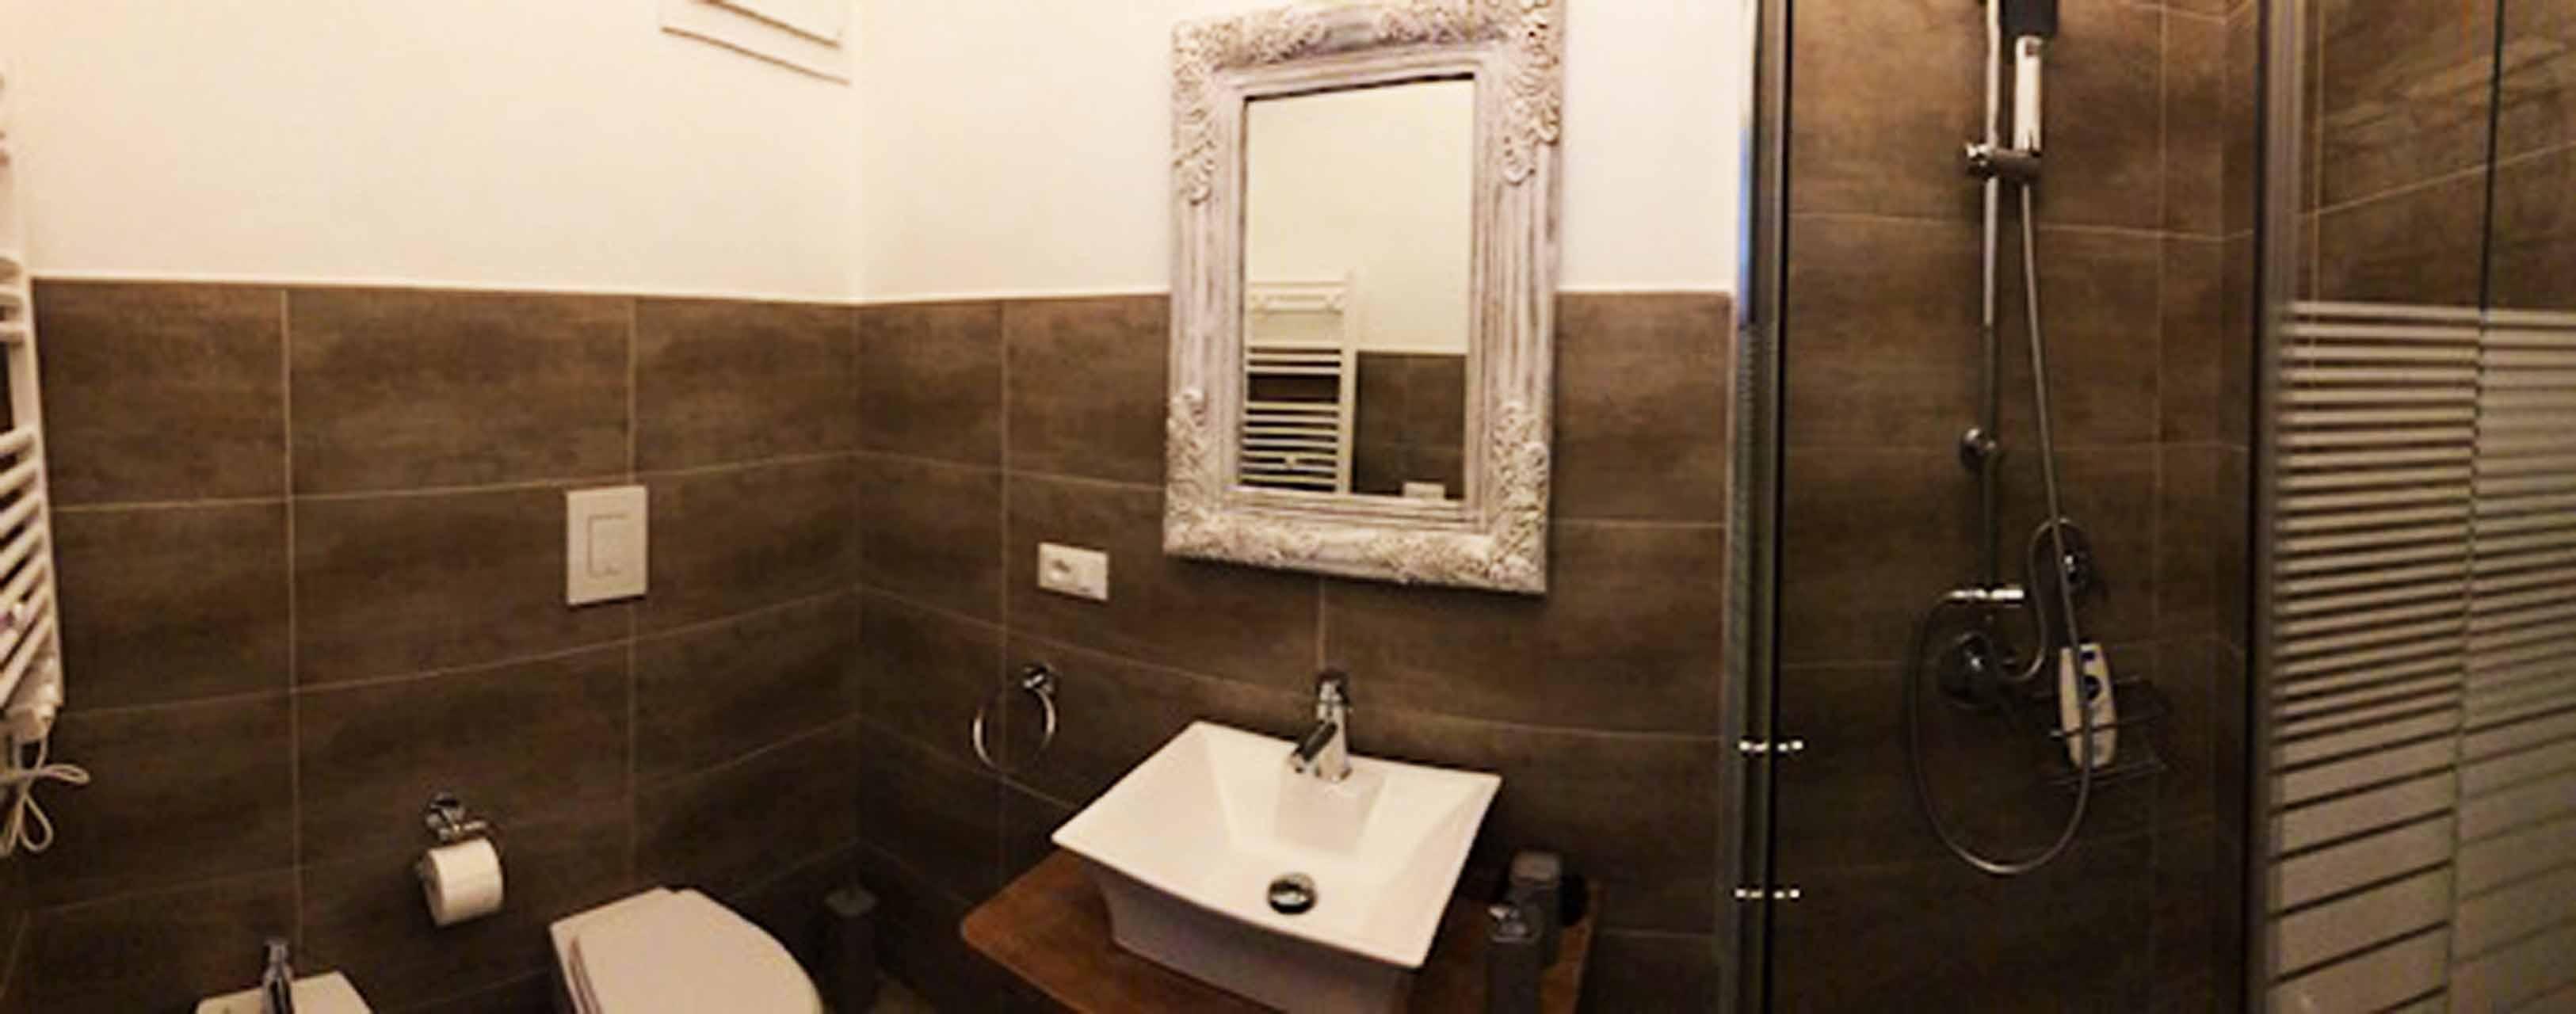 Bathroom_Cassiopea